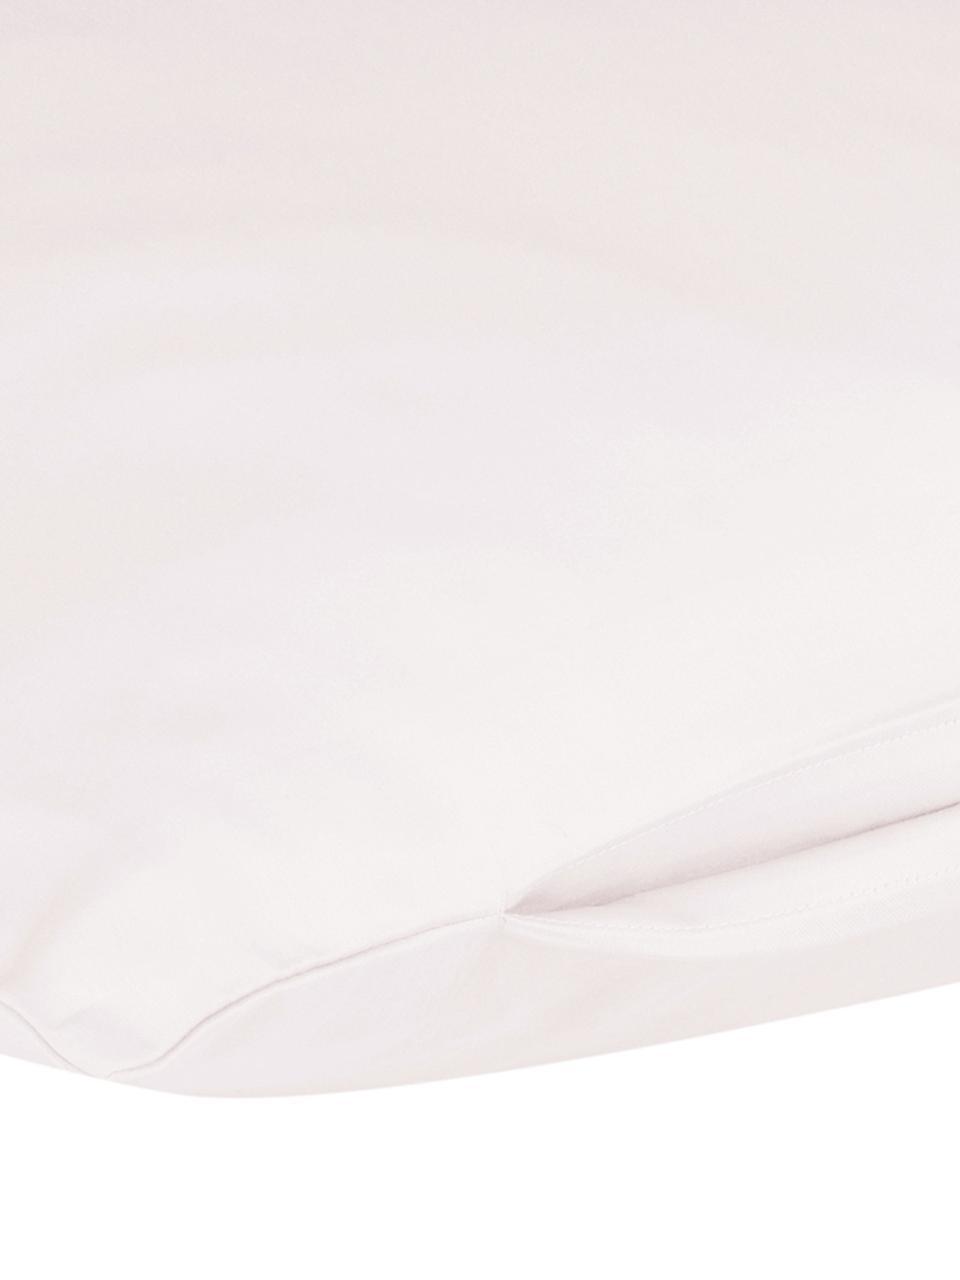 Baumwollsatin-Kissenbezüge Comfort in Rosa, 2 Stück, Webart: Satin Fadendichte 250 TC,, Rosa, 40 x 80 cm